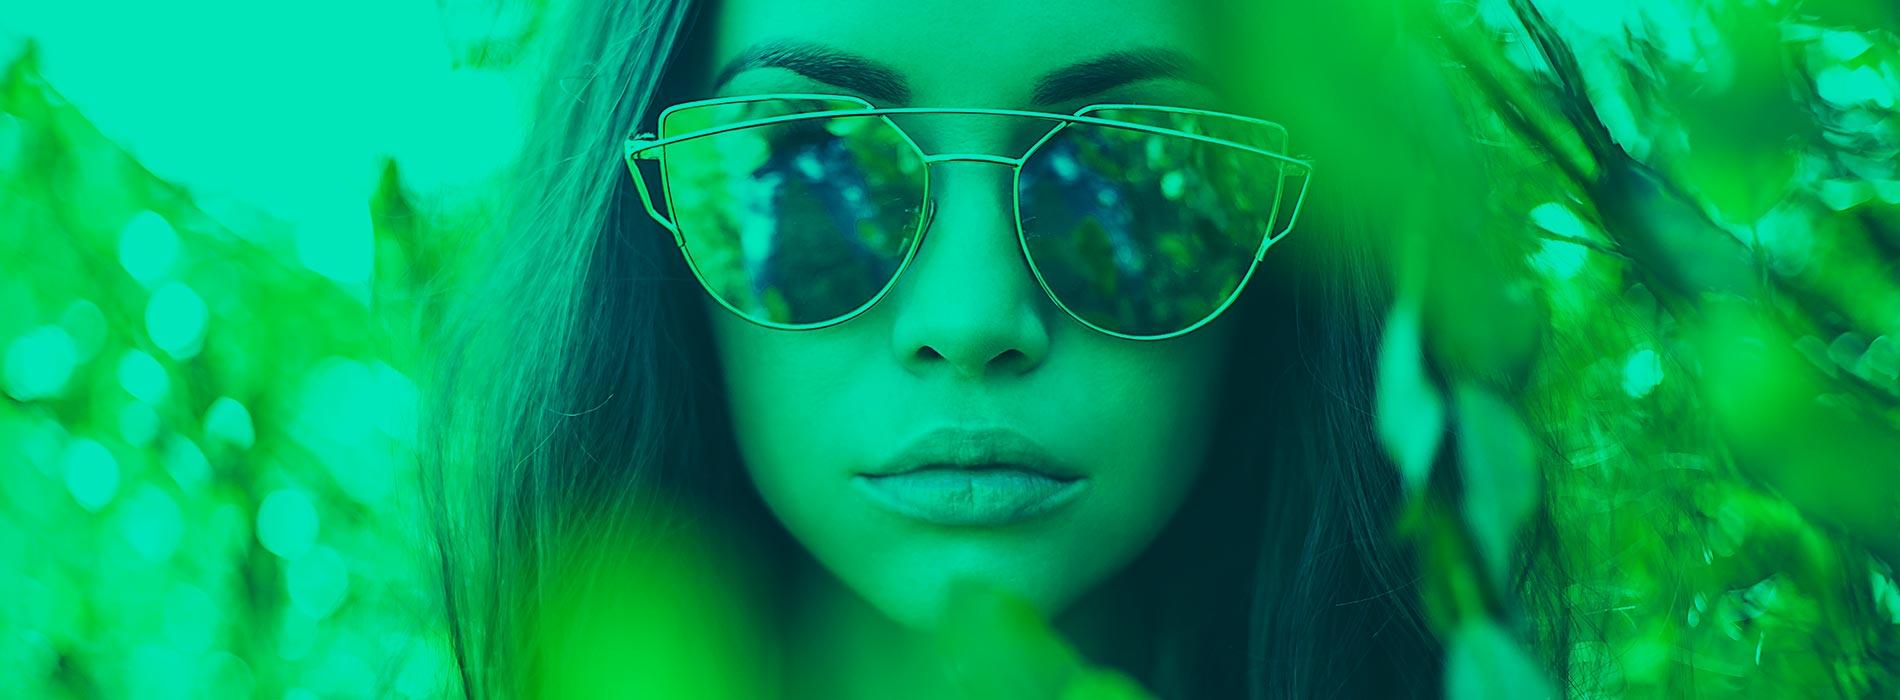 e5f5fdbfec Gafas de sol en Opticalia Callao